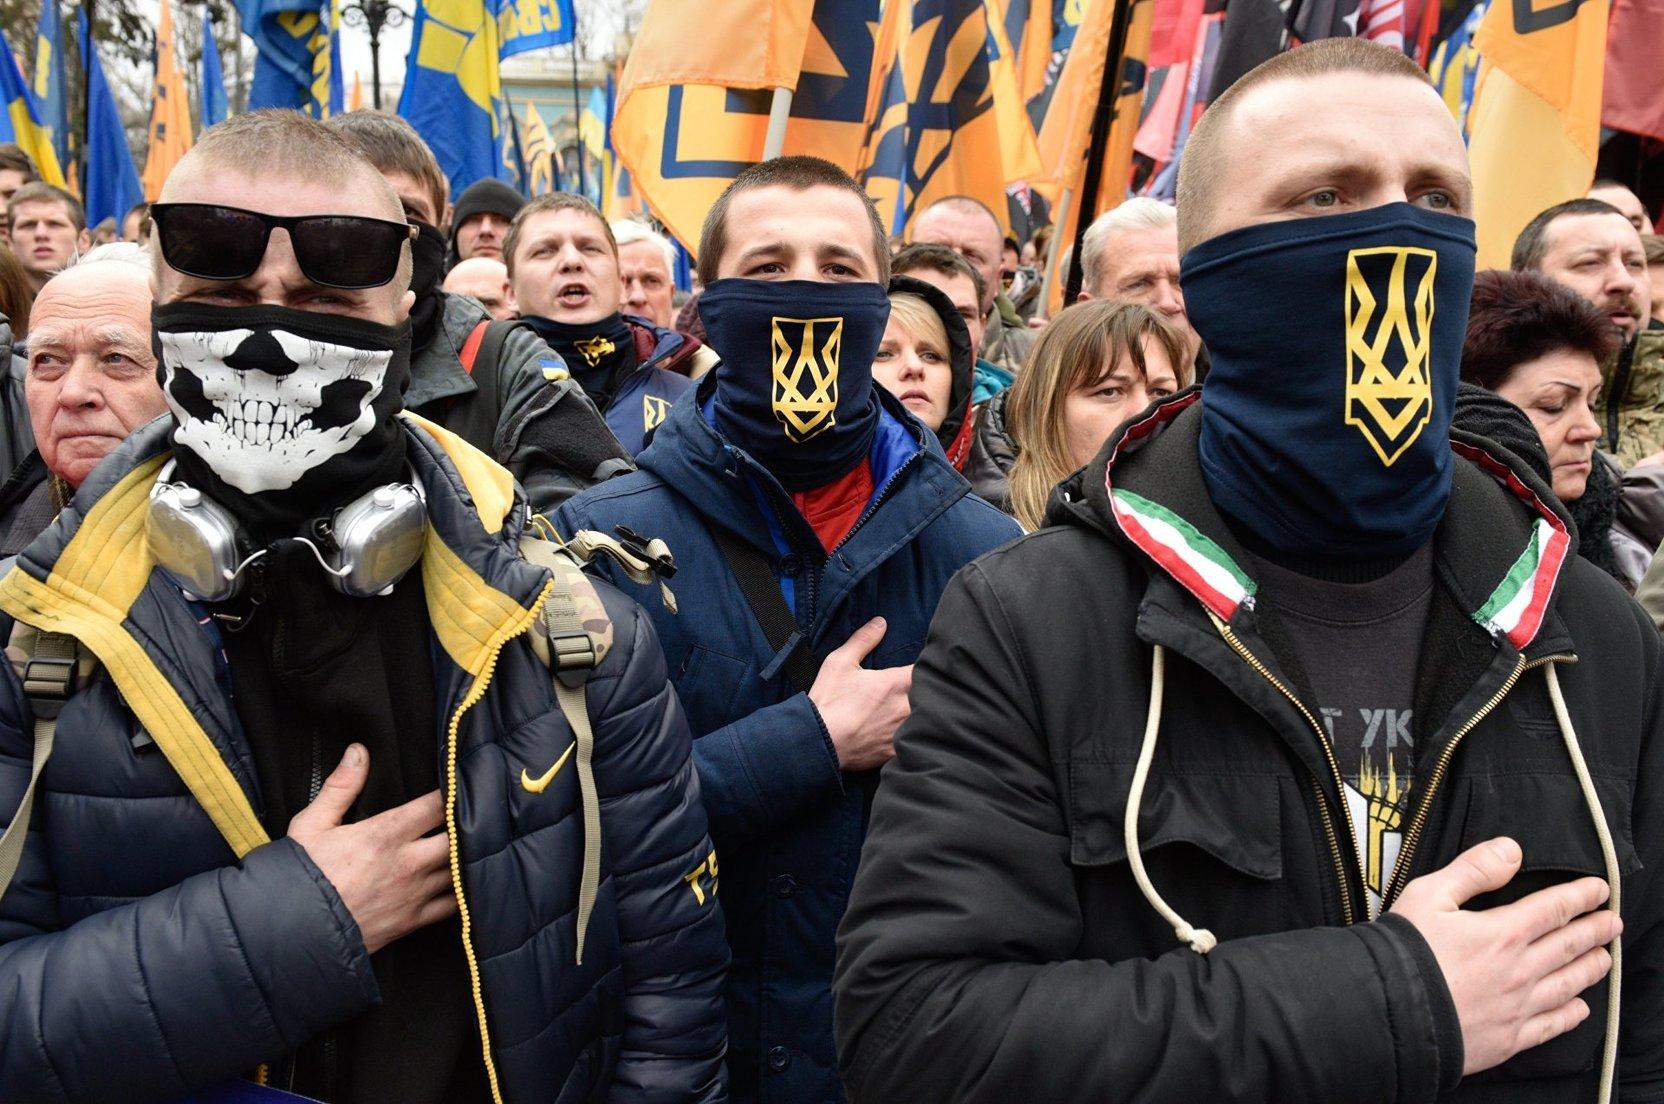 картинки про фашизм на украине арка розария